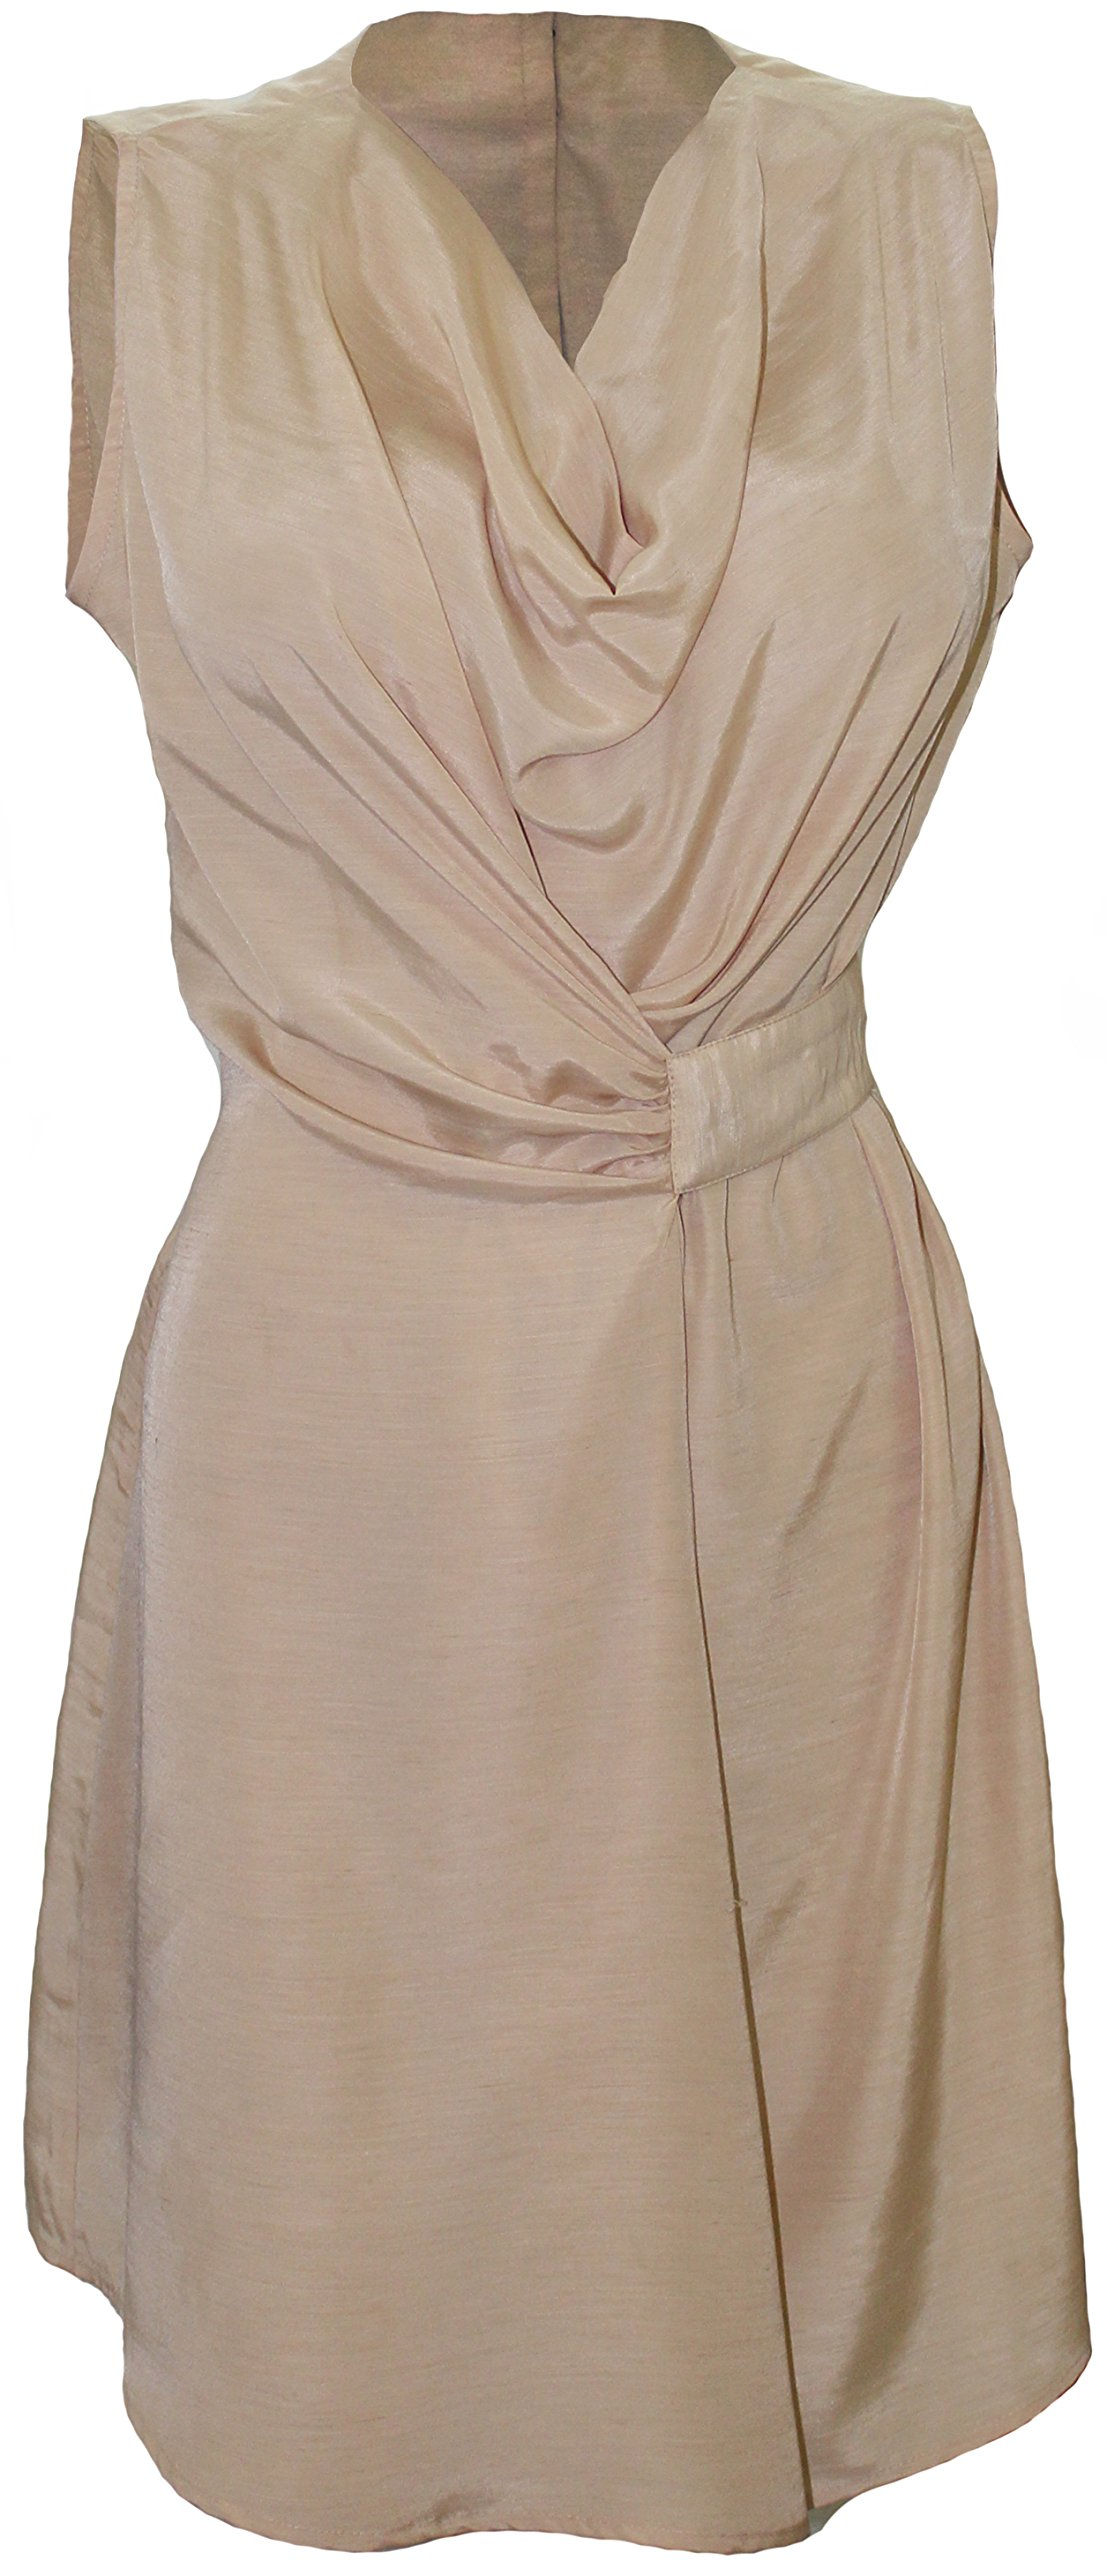 Attuendo Womenès Summer Collection Edyen Limited Edition Dress (X-Large (US Size:10))